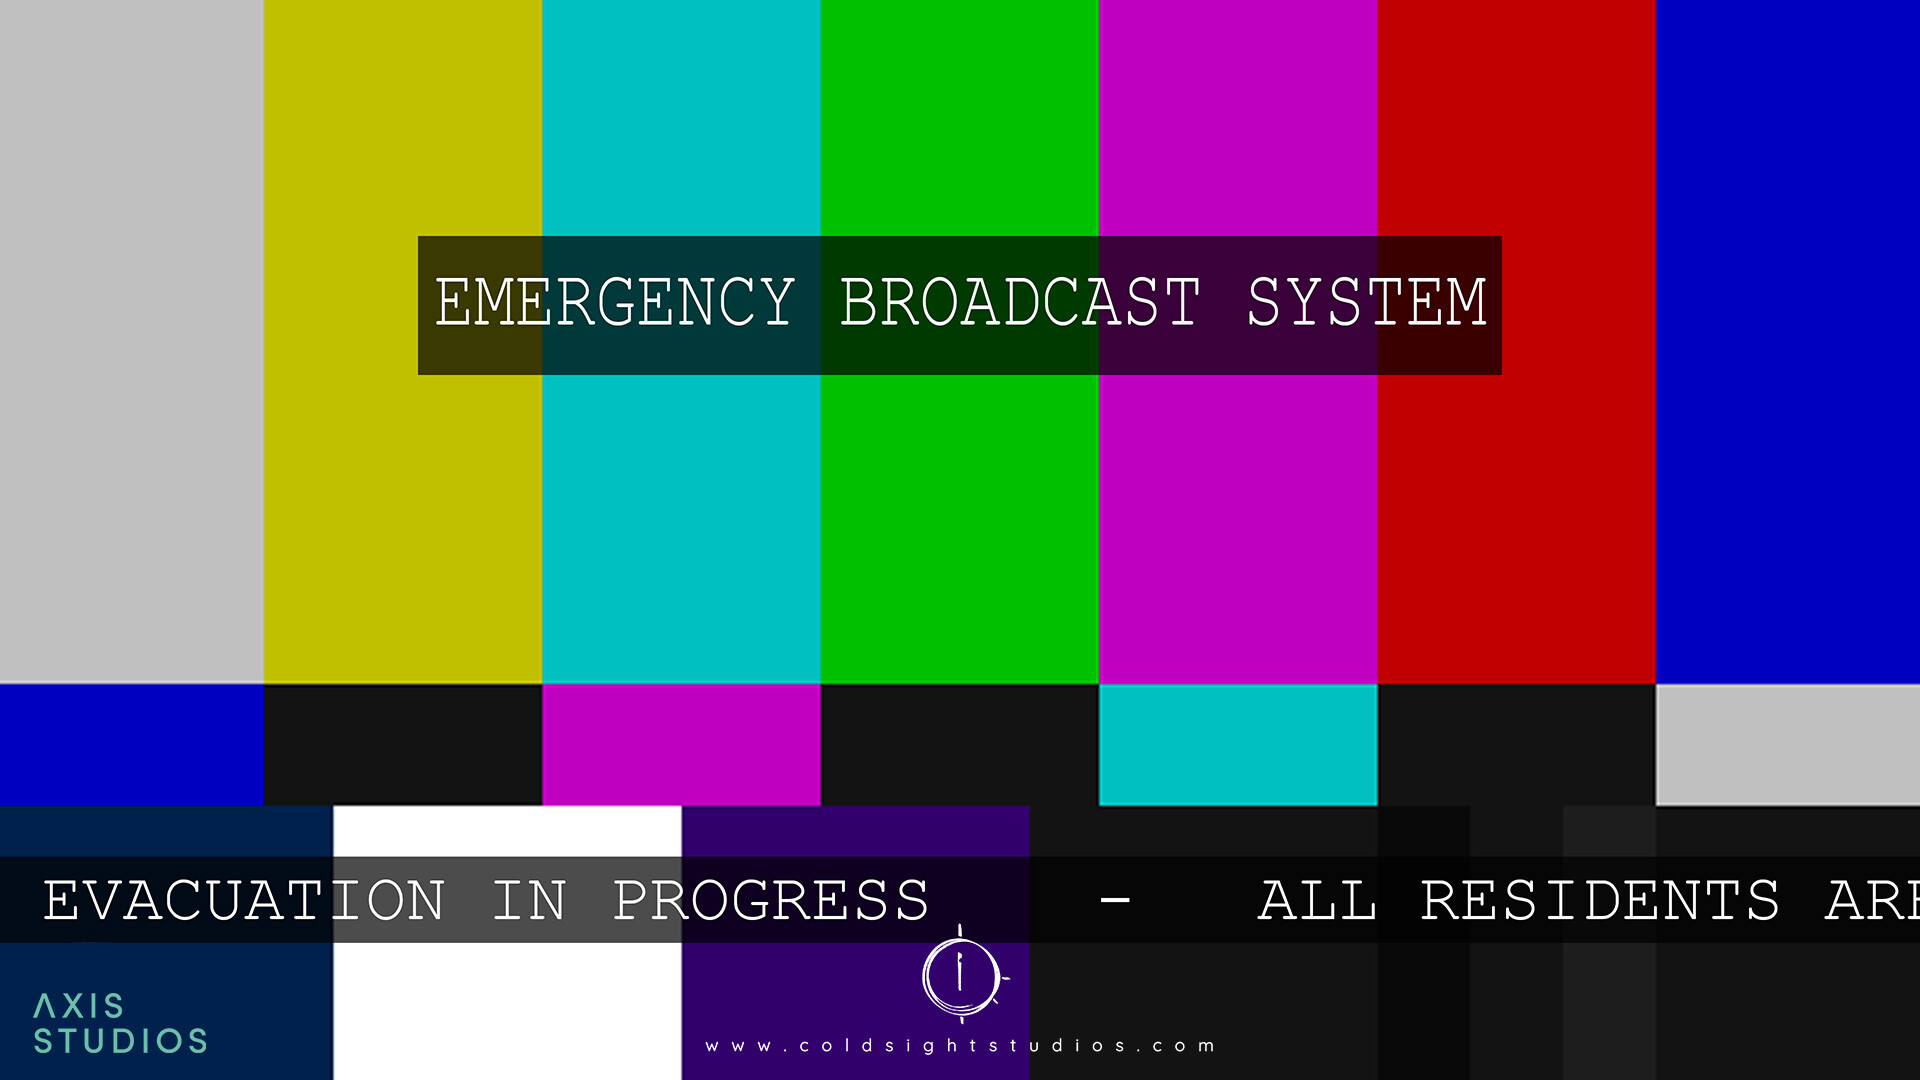 Alessandro chirico nola tvgraphics emergency v001